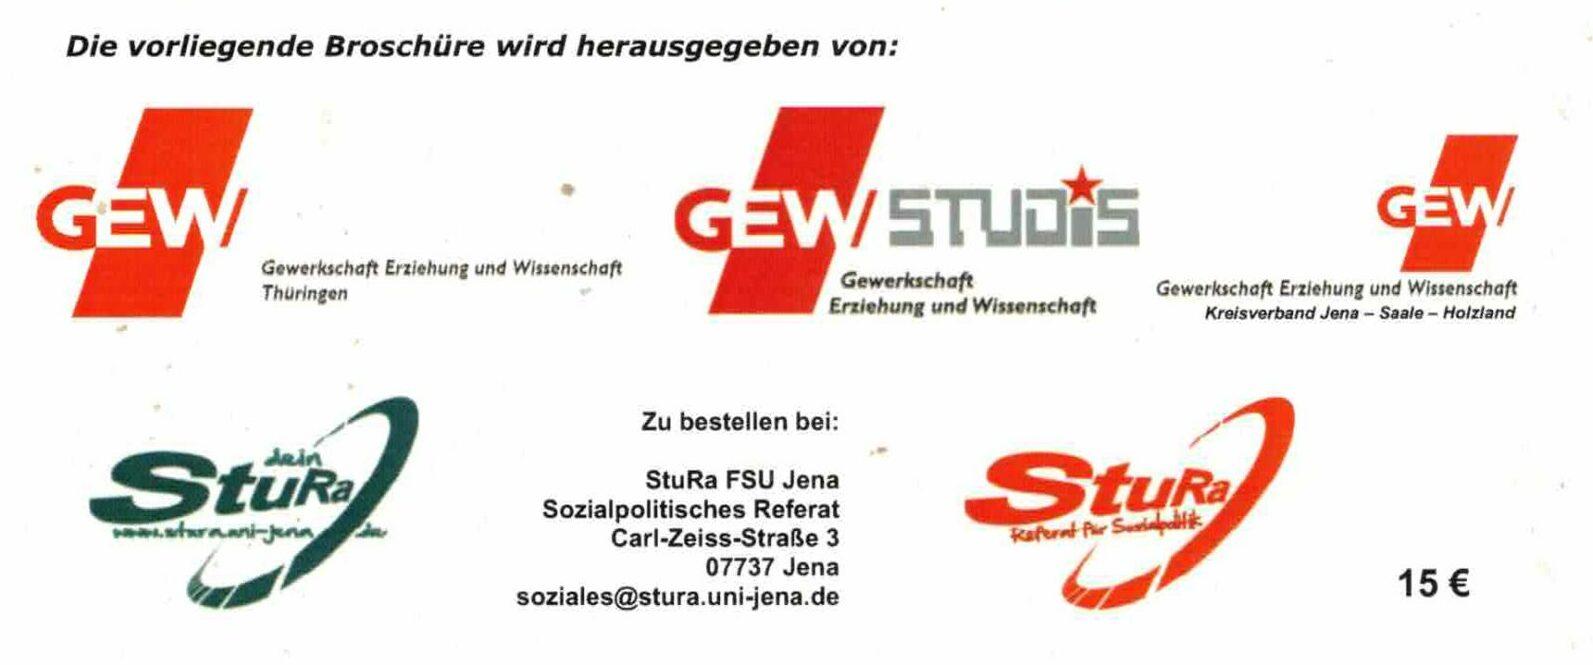 "Figure 6: The editors of the GEW brochure ""Dokumente"" (Documents), February 2011."